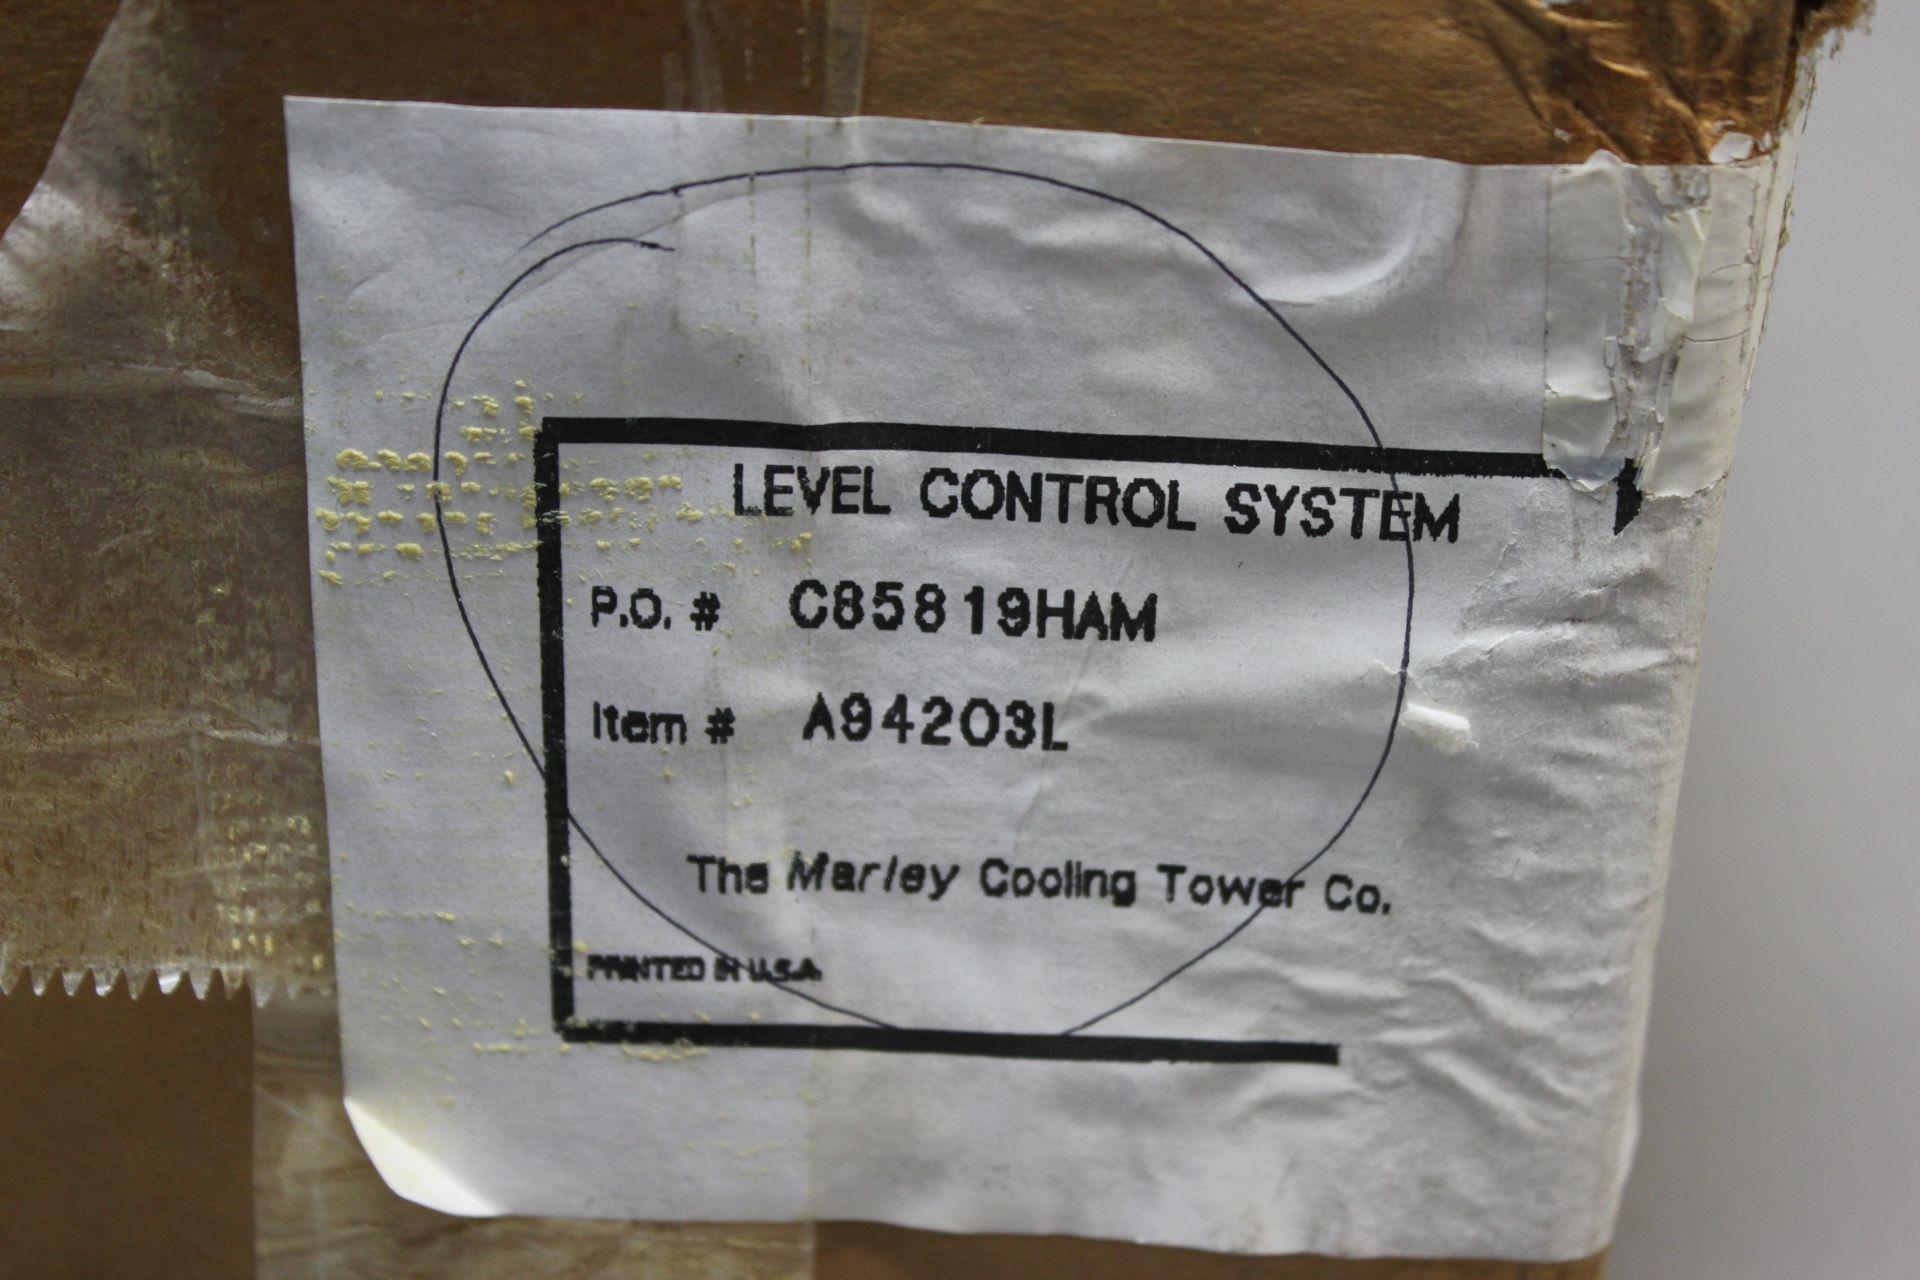 NEW B/W/PATRIOT CONTROL LIQUID LEVEL RELAY BOARD - Image 2 of 9